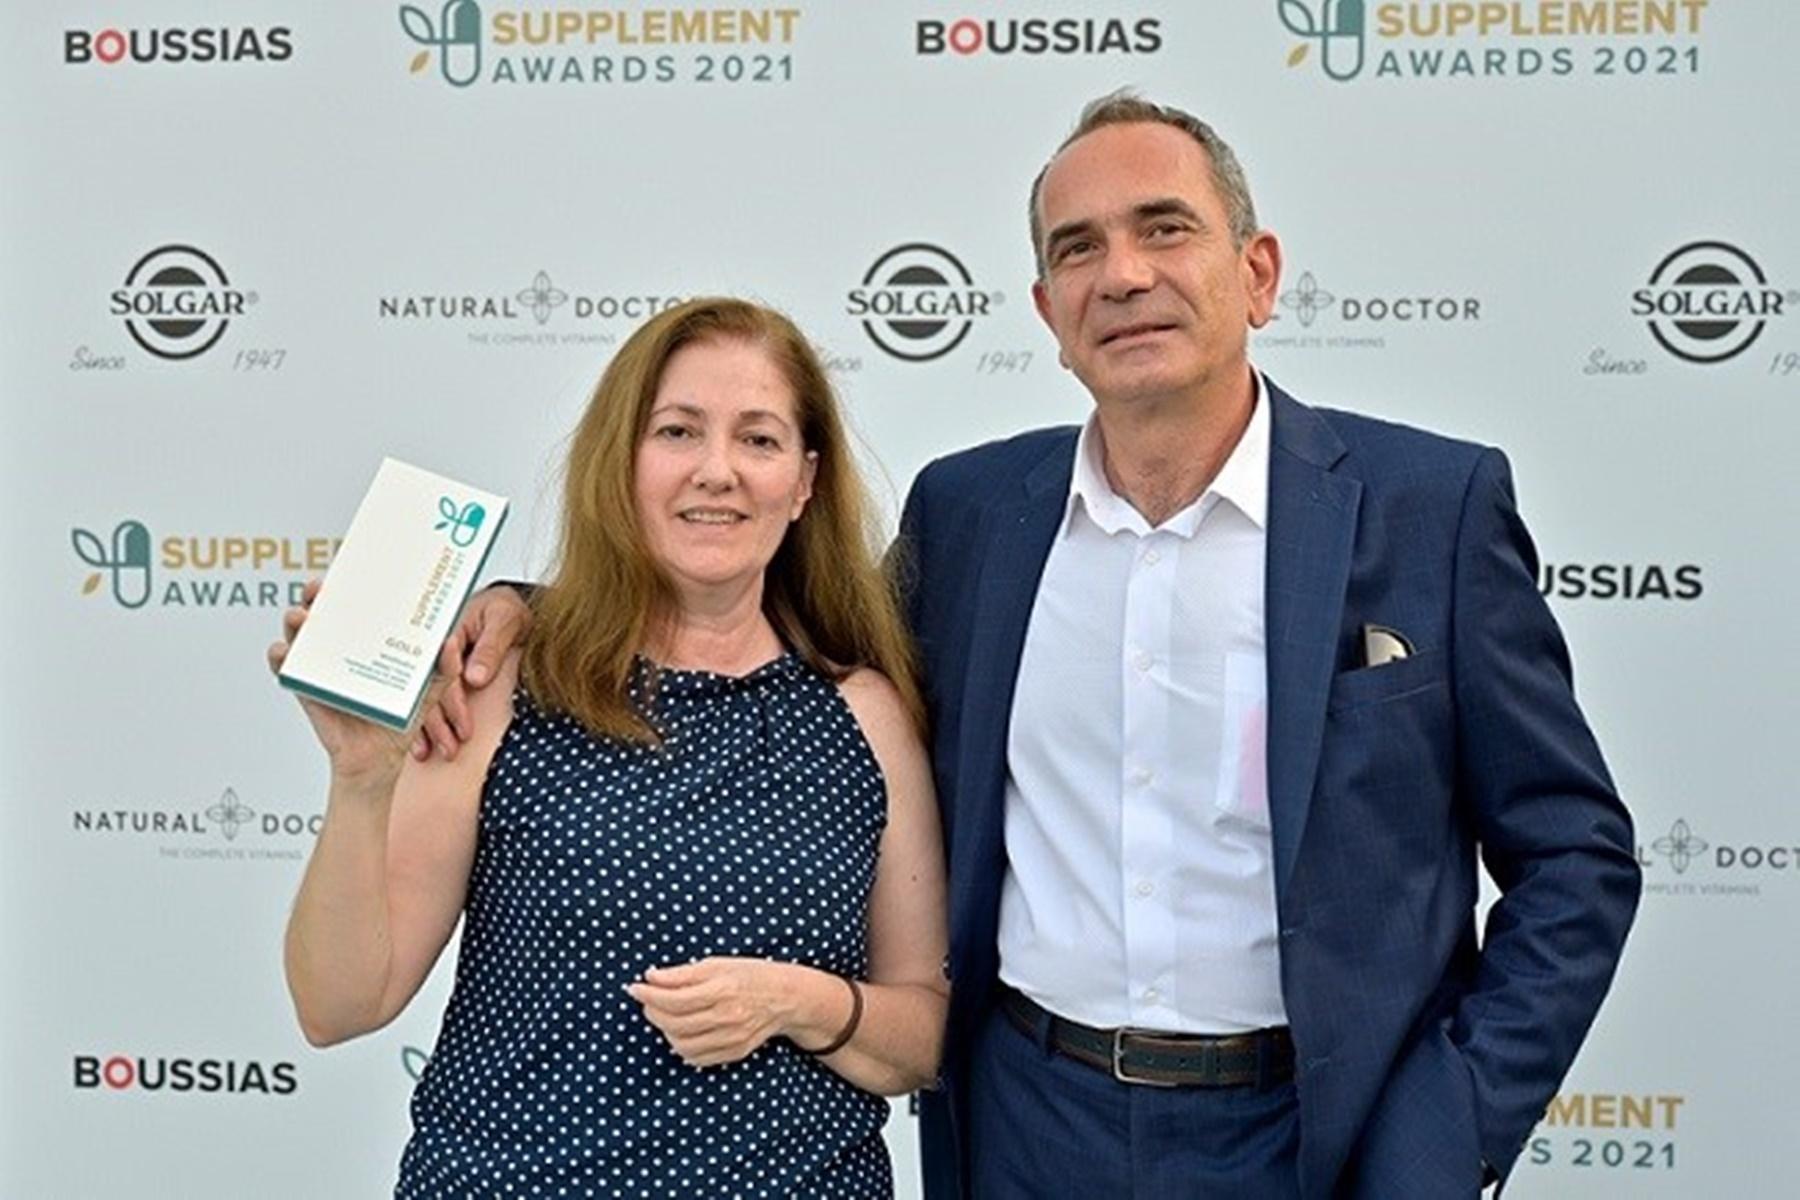 WinMedica : Βραβεύτηκε για το συμπλήρωμα διατροφής που ανακάλυψε